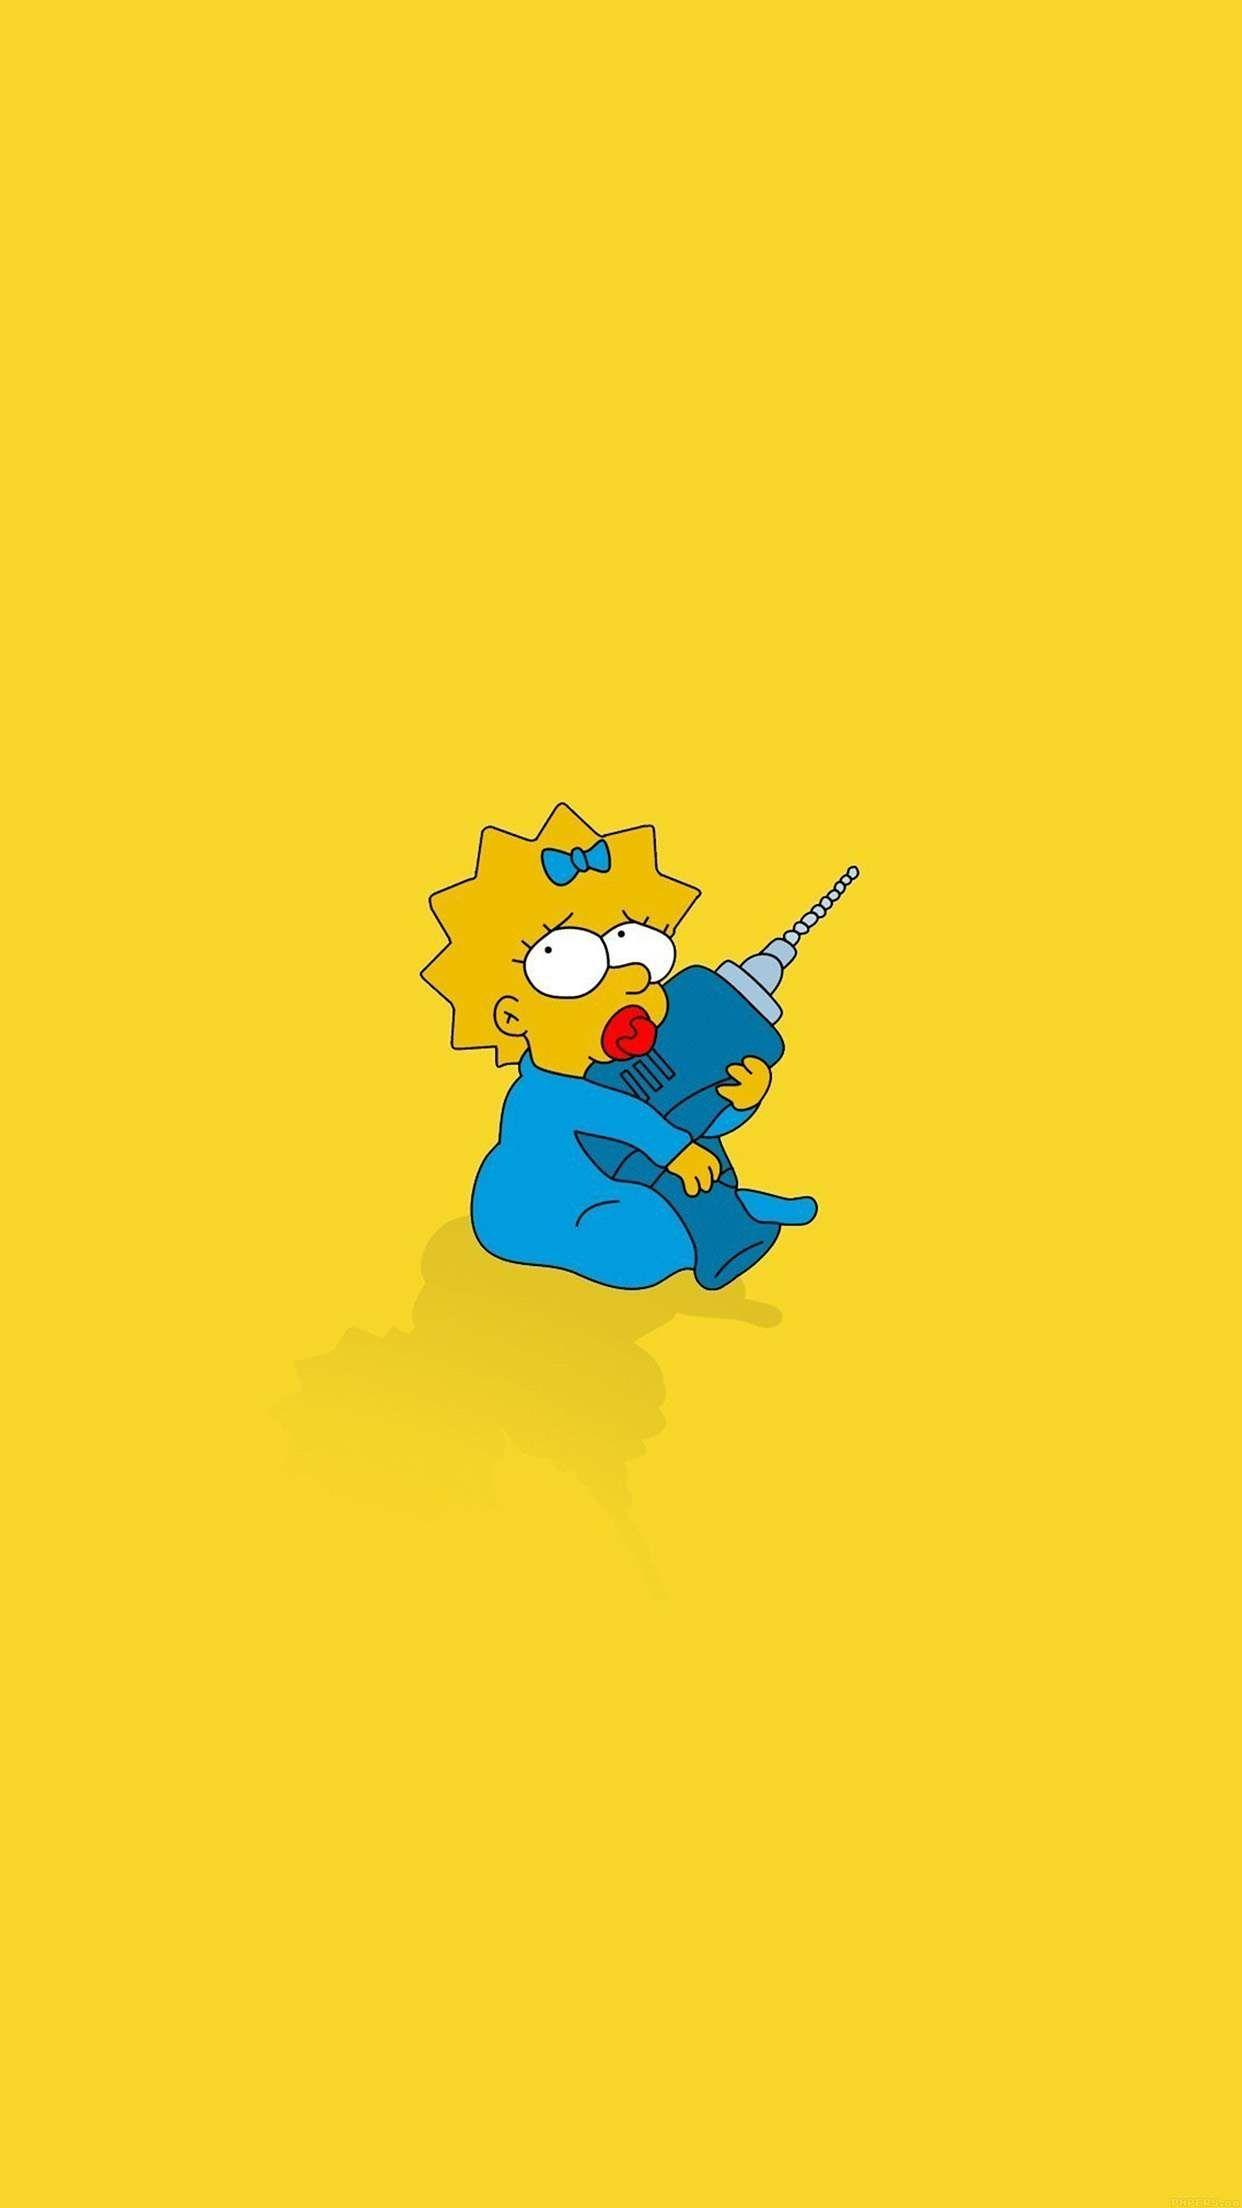 Download Mega Collection Of Cool Iphone Wallpapers Cartoon Cartoon Os Simpsons Wallpaper De Desenhos Animados